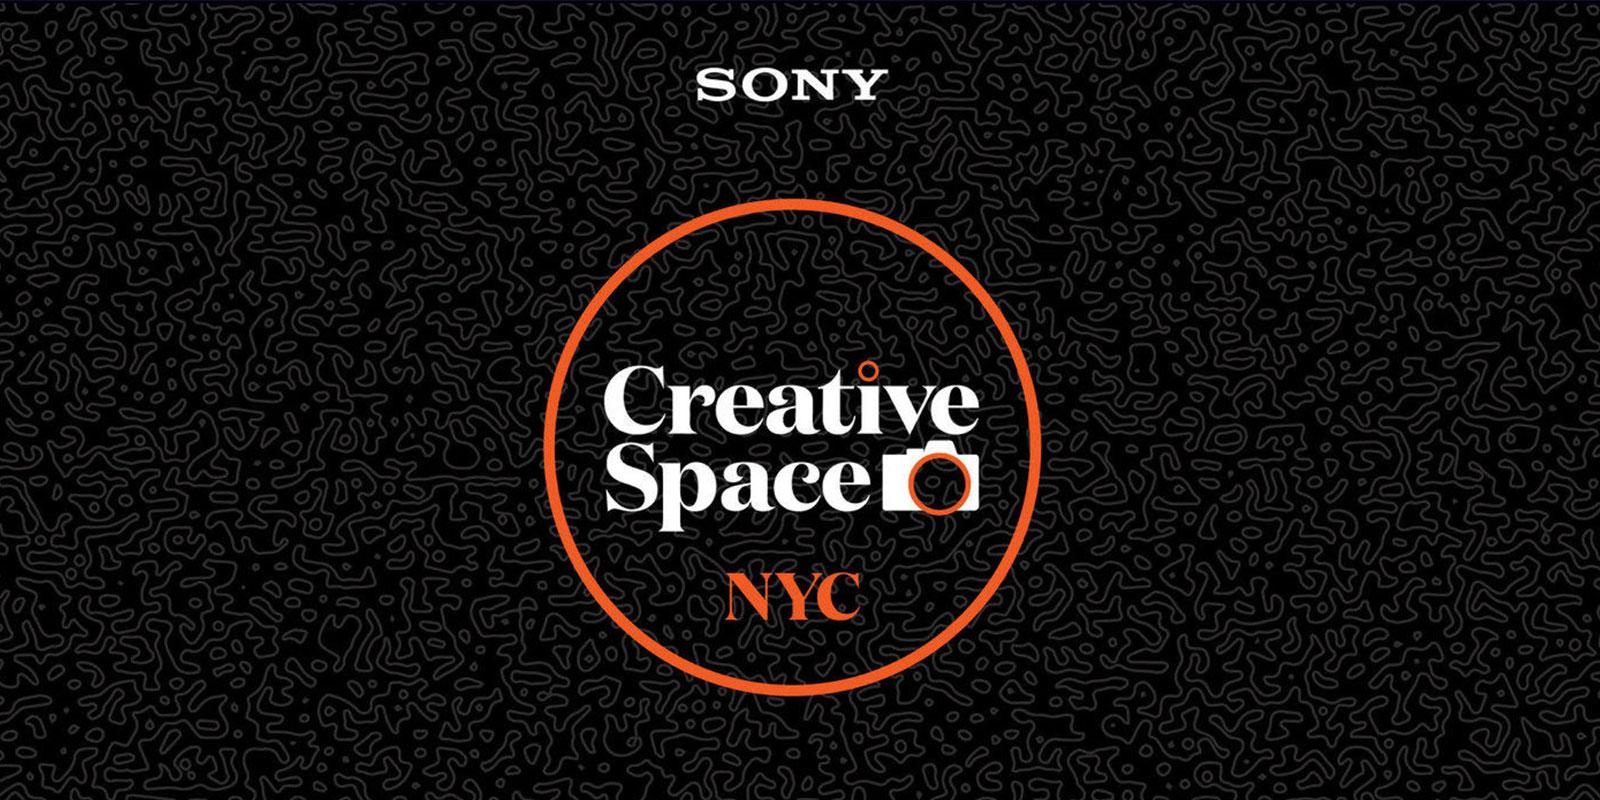 Sony Creative Space NYC 2019